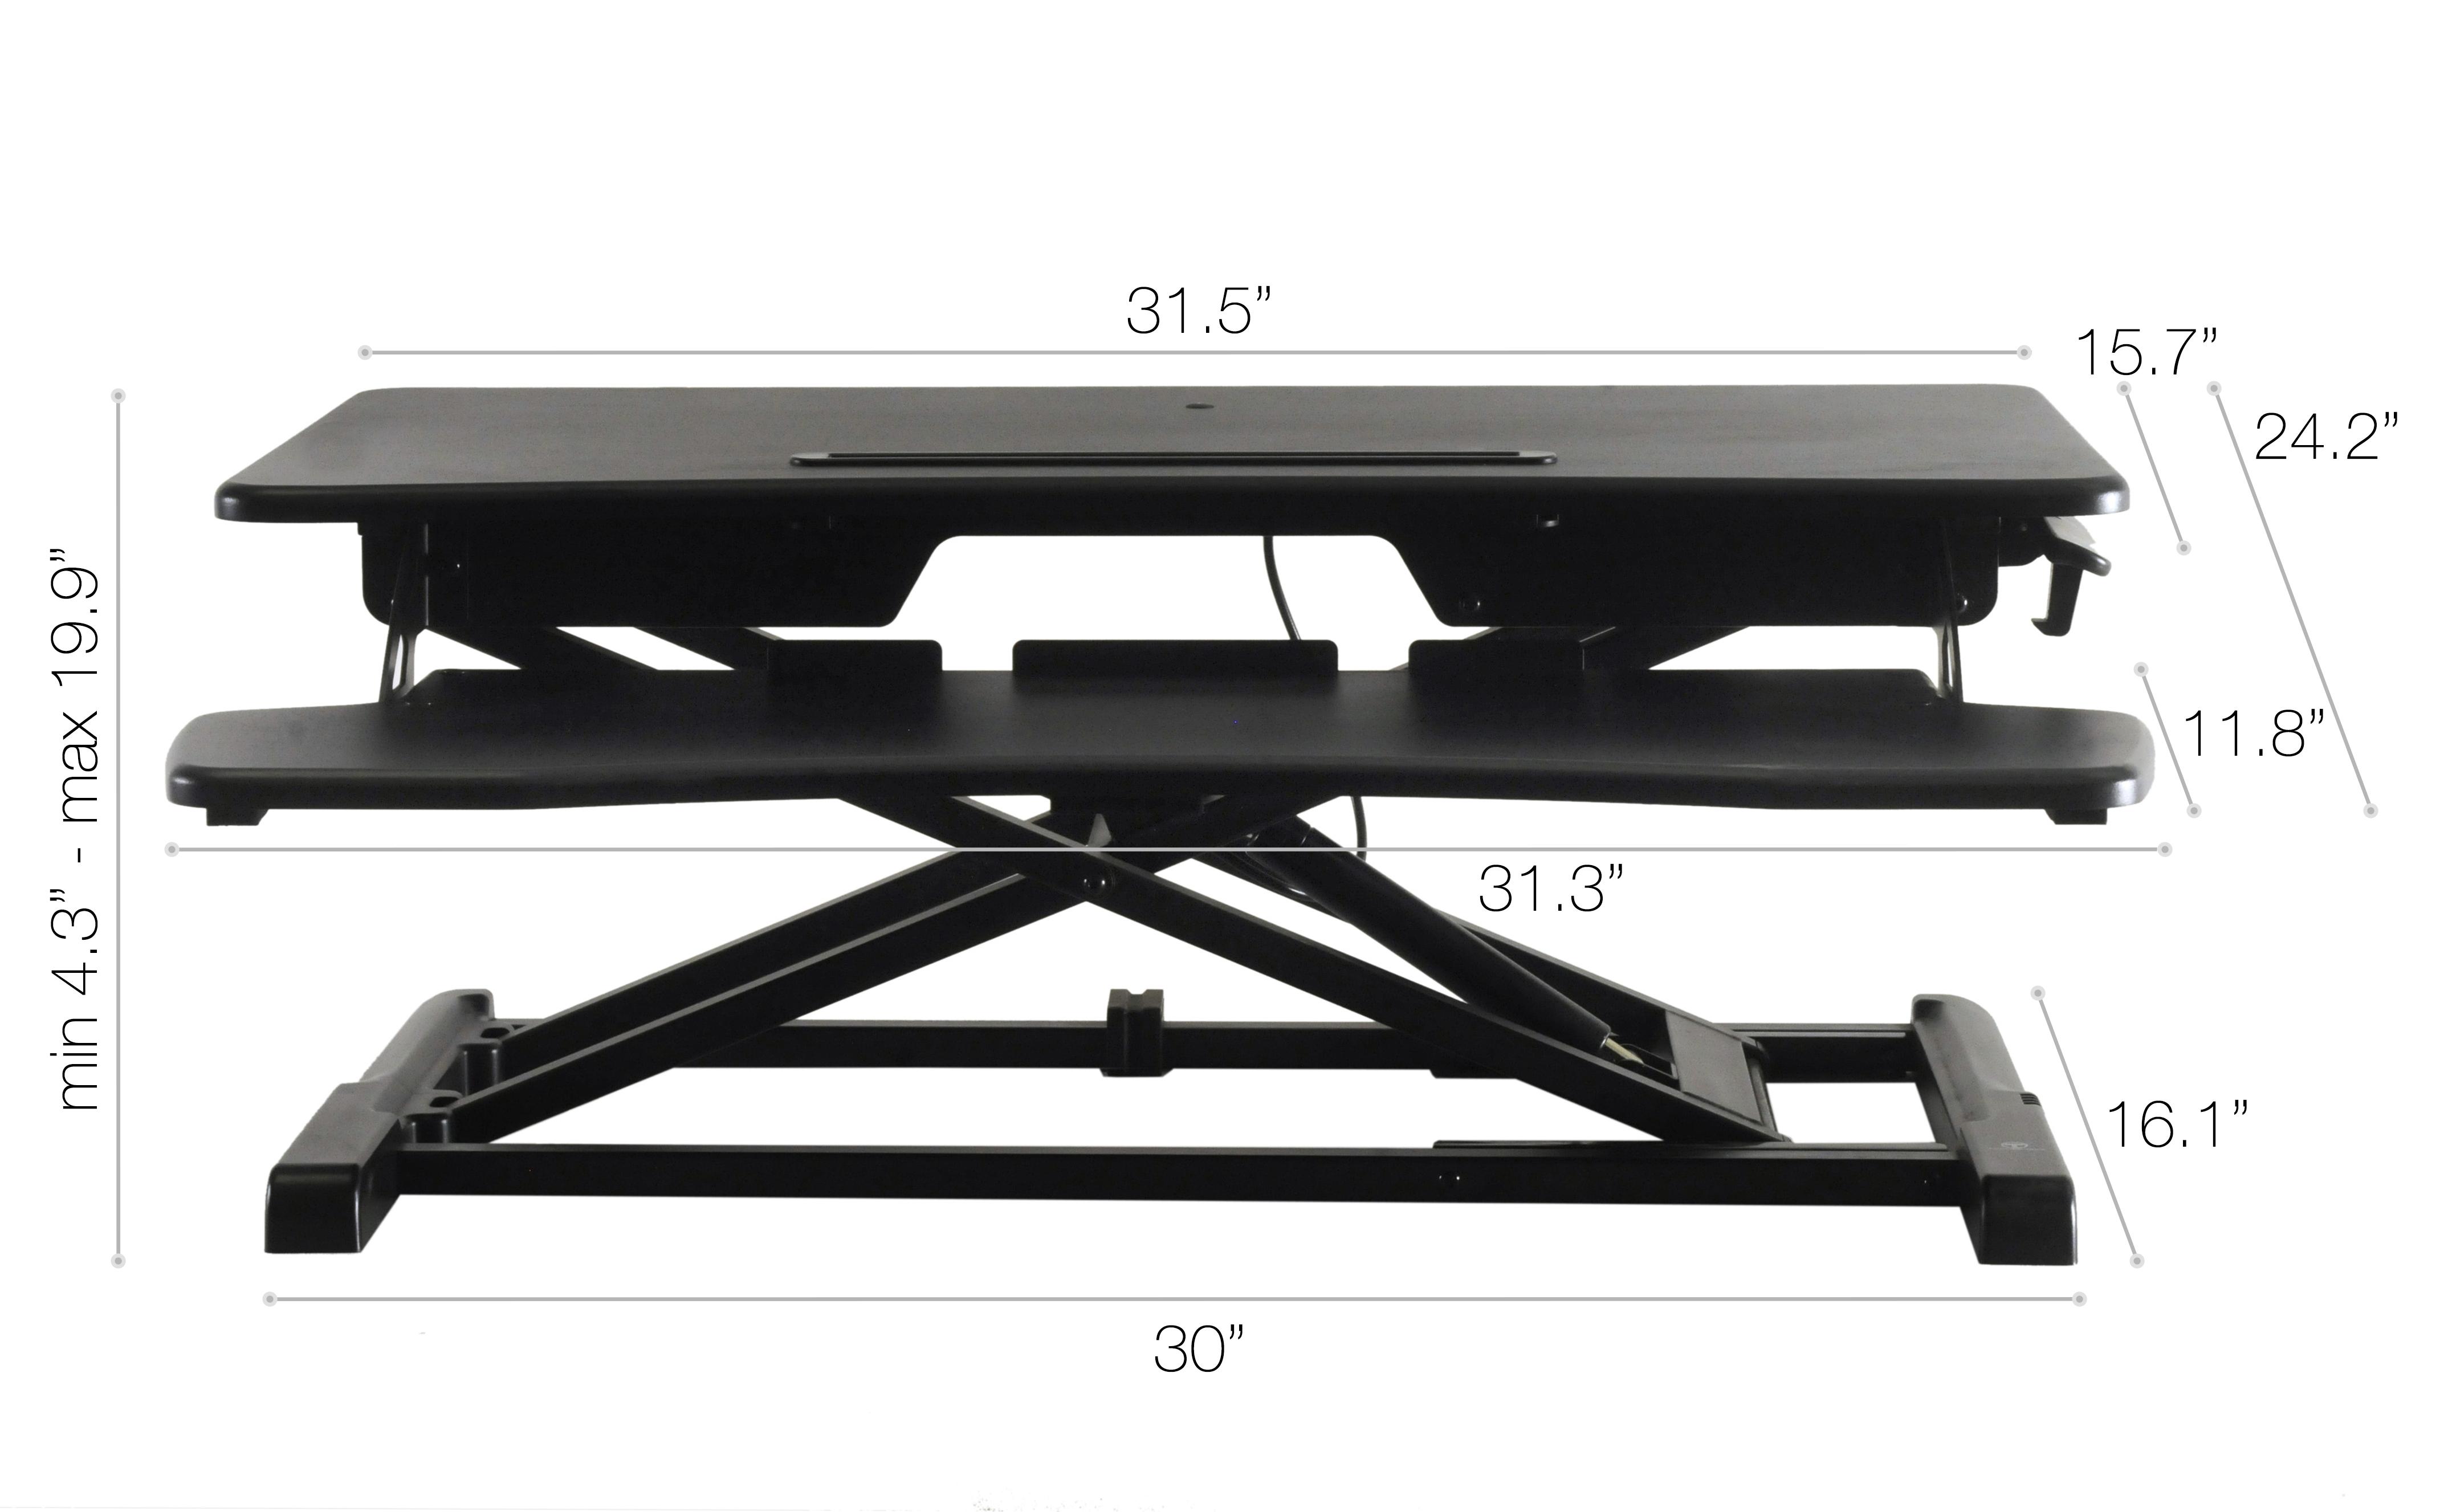 Rise-X-Light-Standing-Desk-Stand-Up-Desk-Height-Adjustable-Desk-Converter thumbnail 8